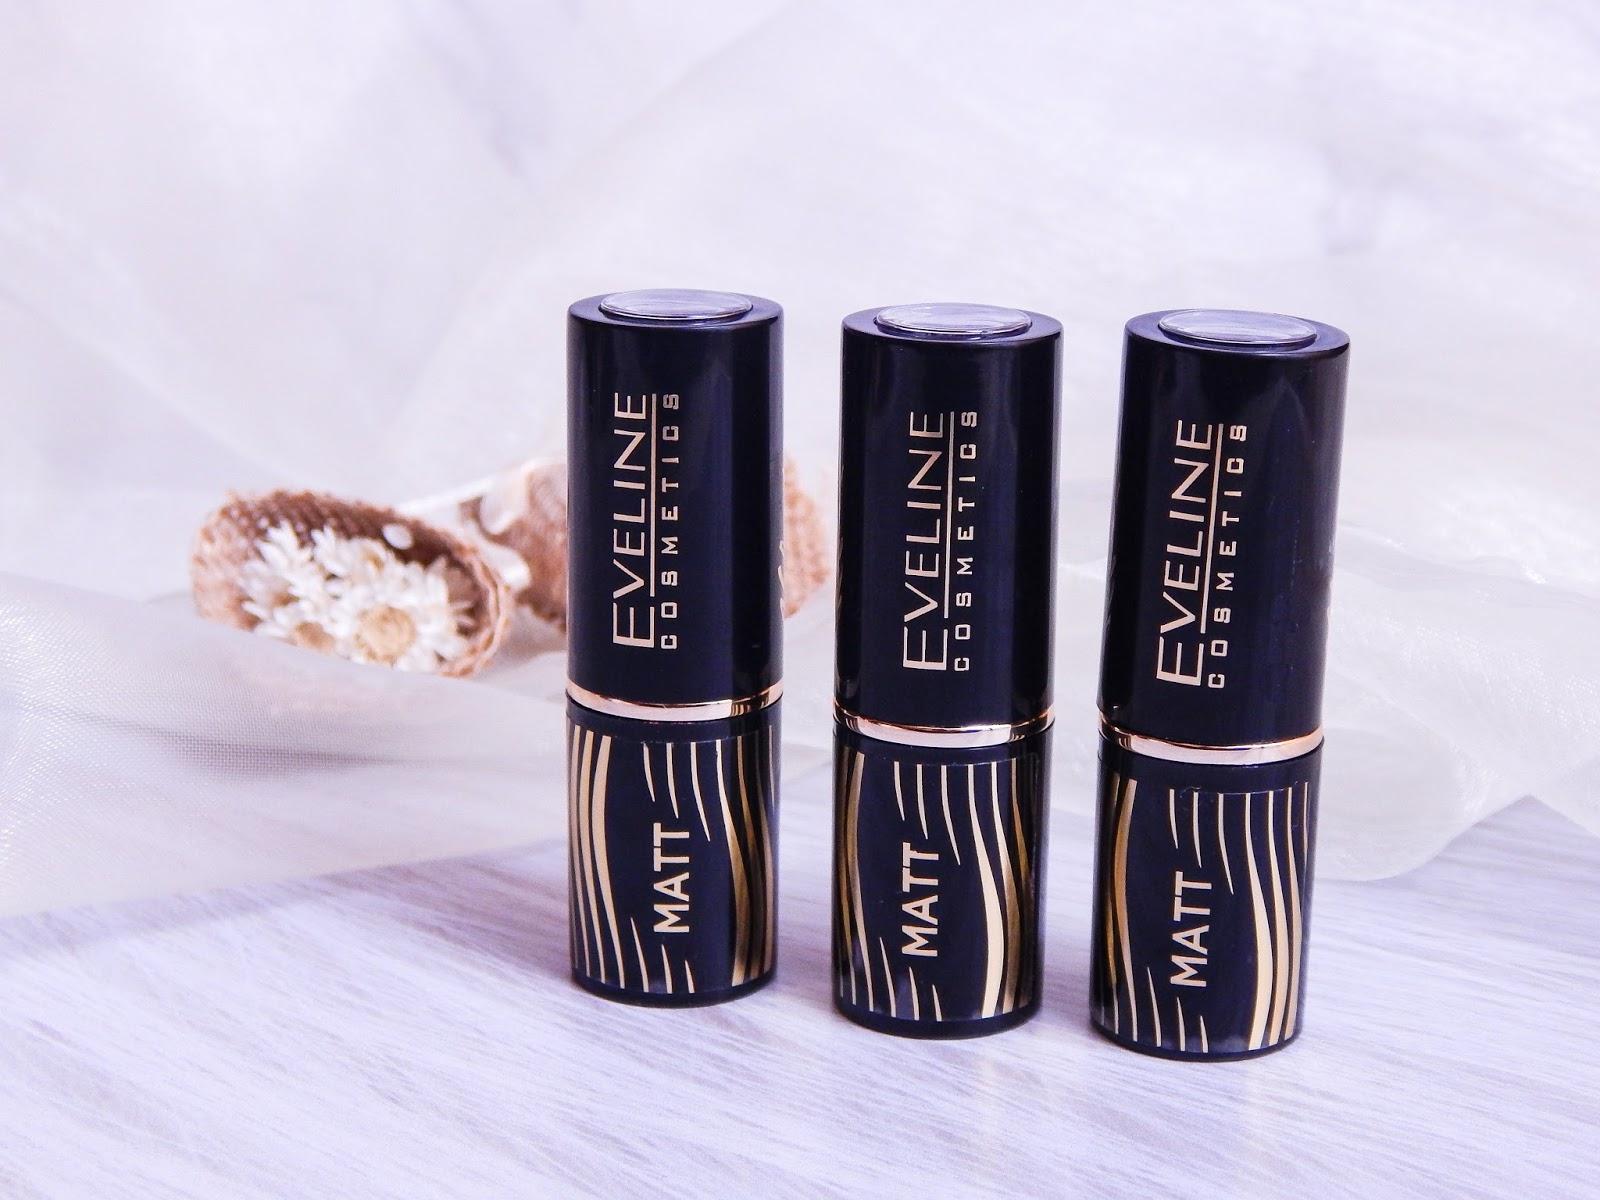 eveline velvet matt lipstick precious oils lip elixir matowe pomadki błyszczyki olejki do ust recenzja eveline cosmetics